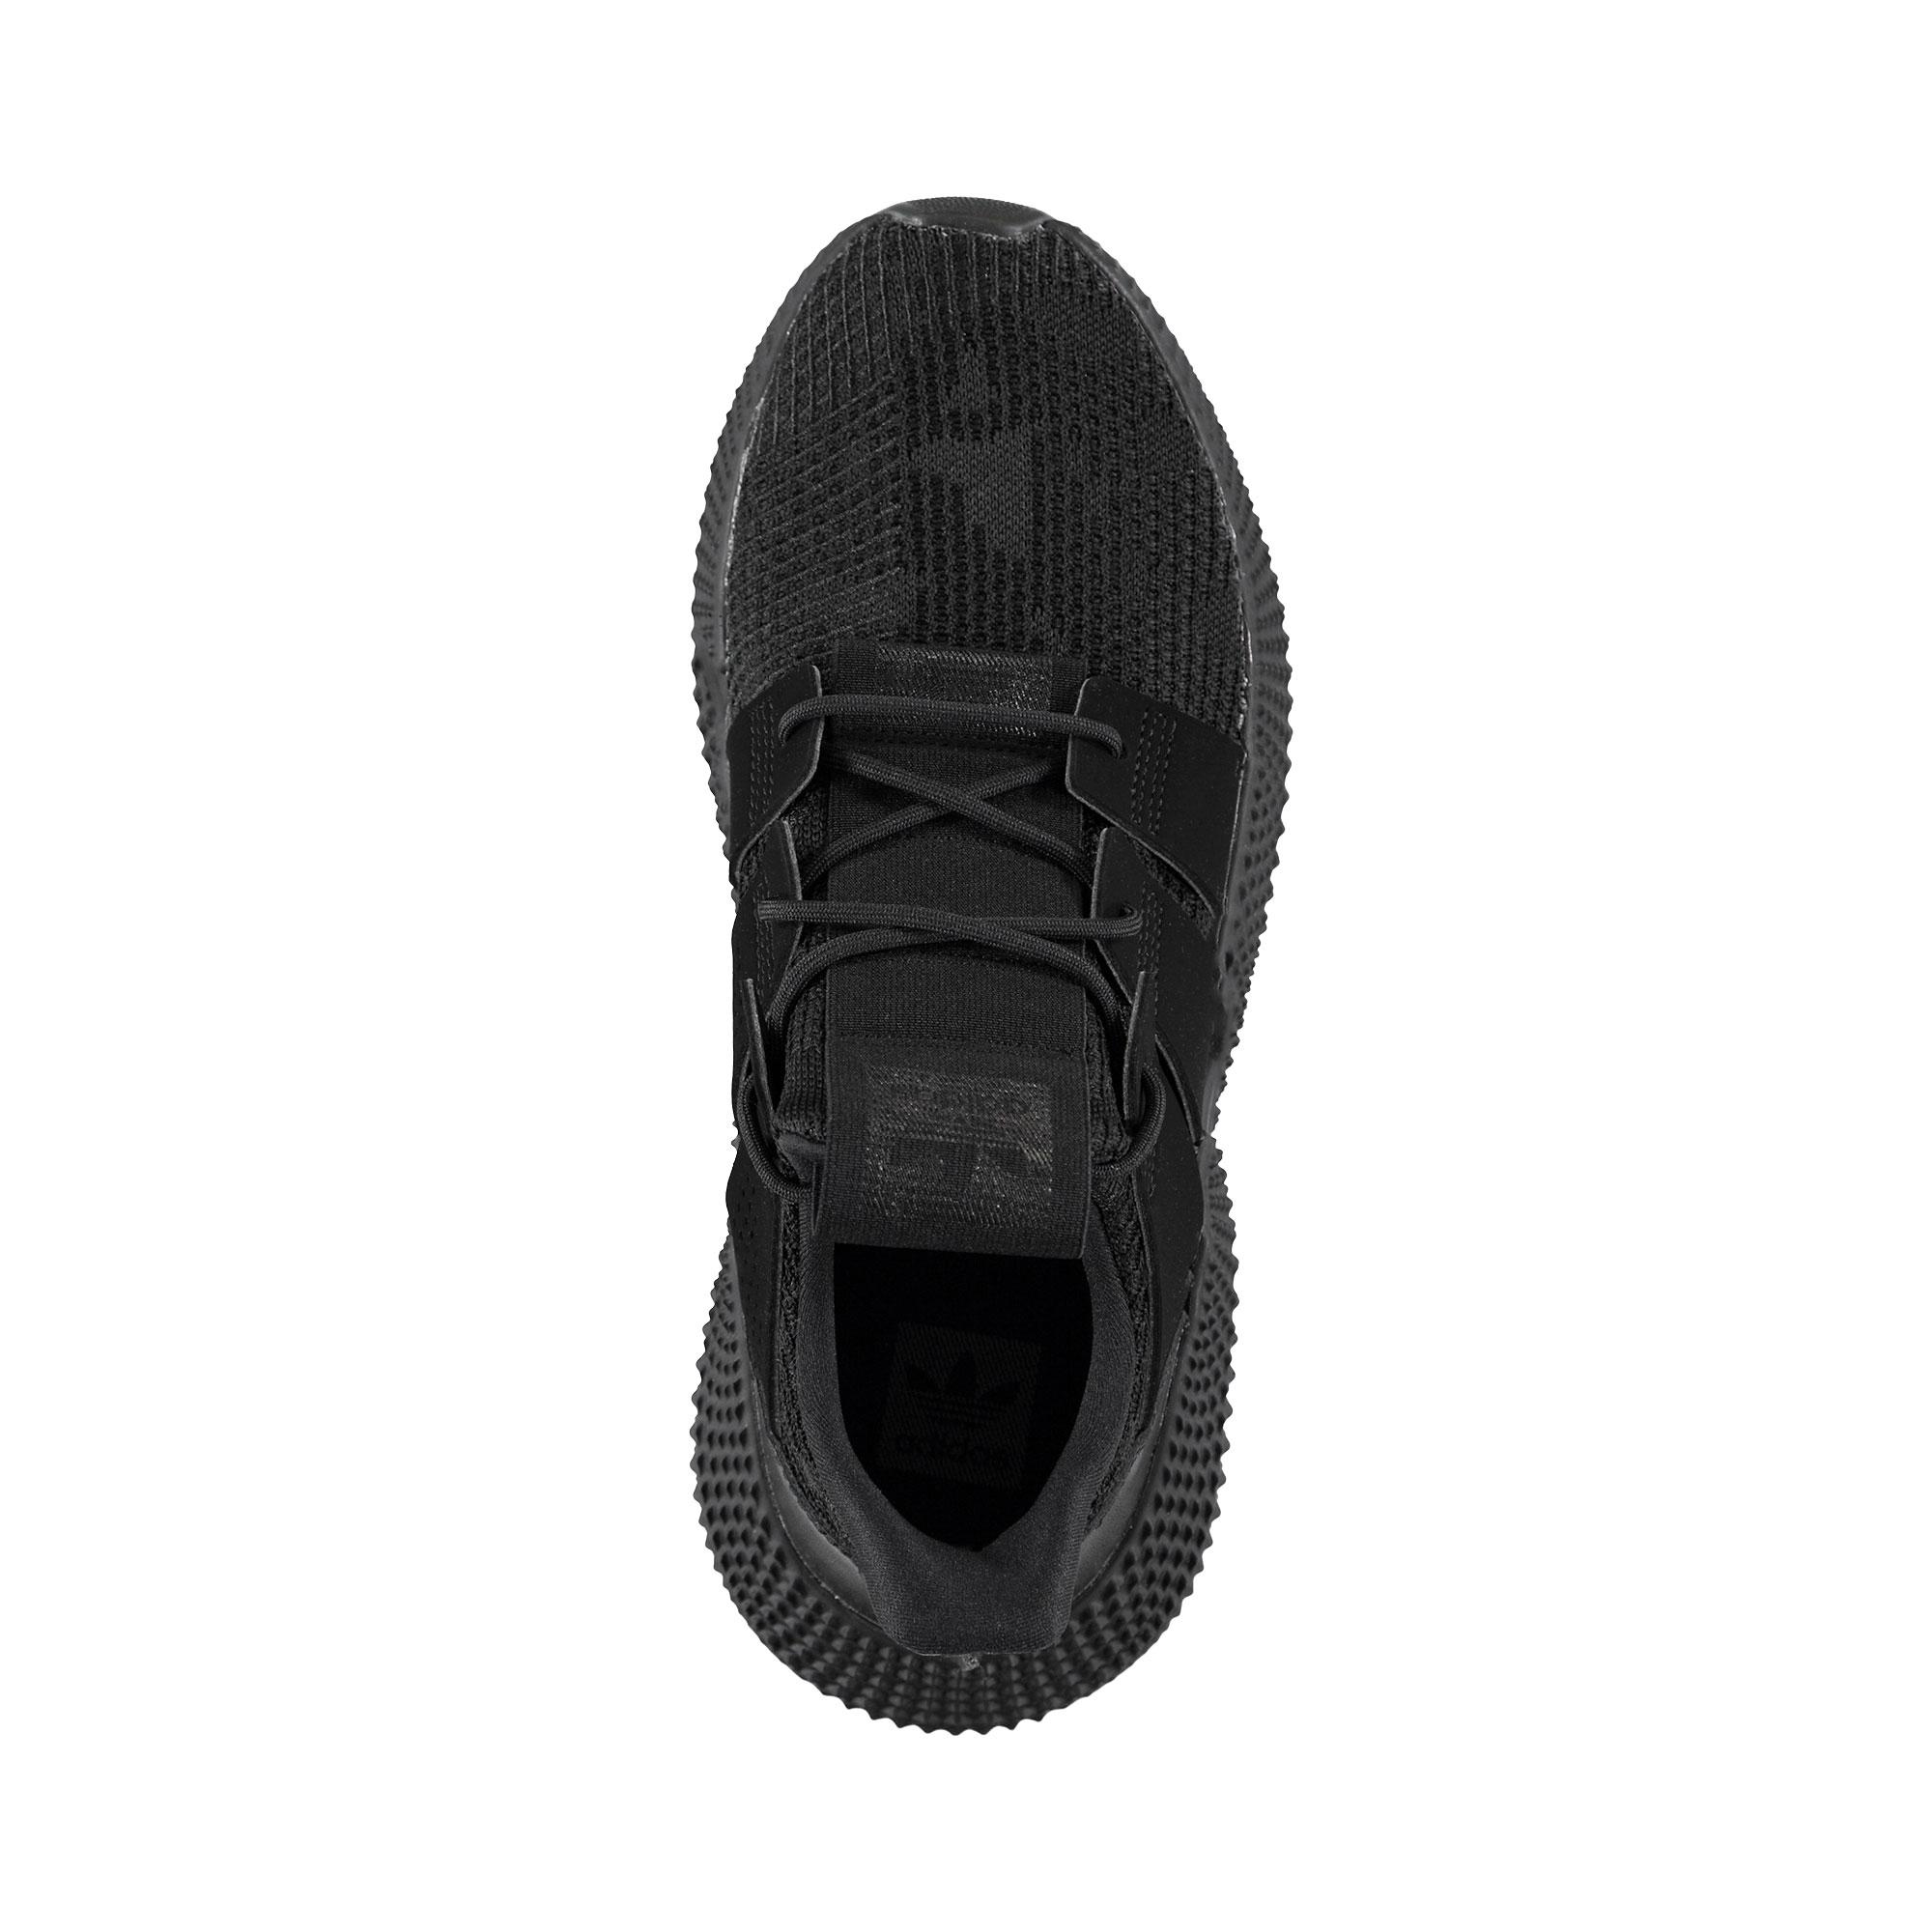 adidas Originals Prophere Erkek Siyah Spor Ayakkabı